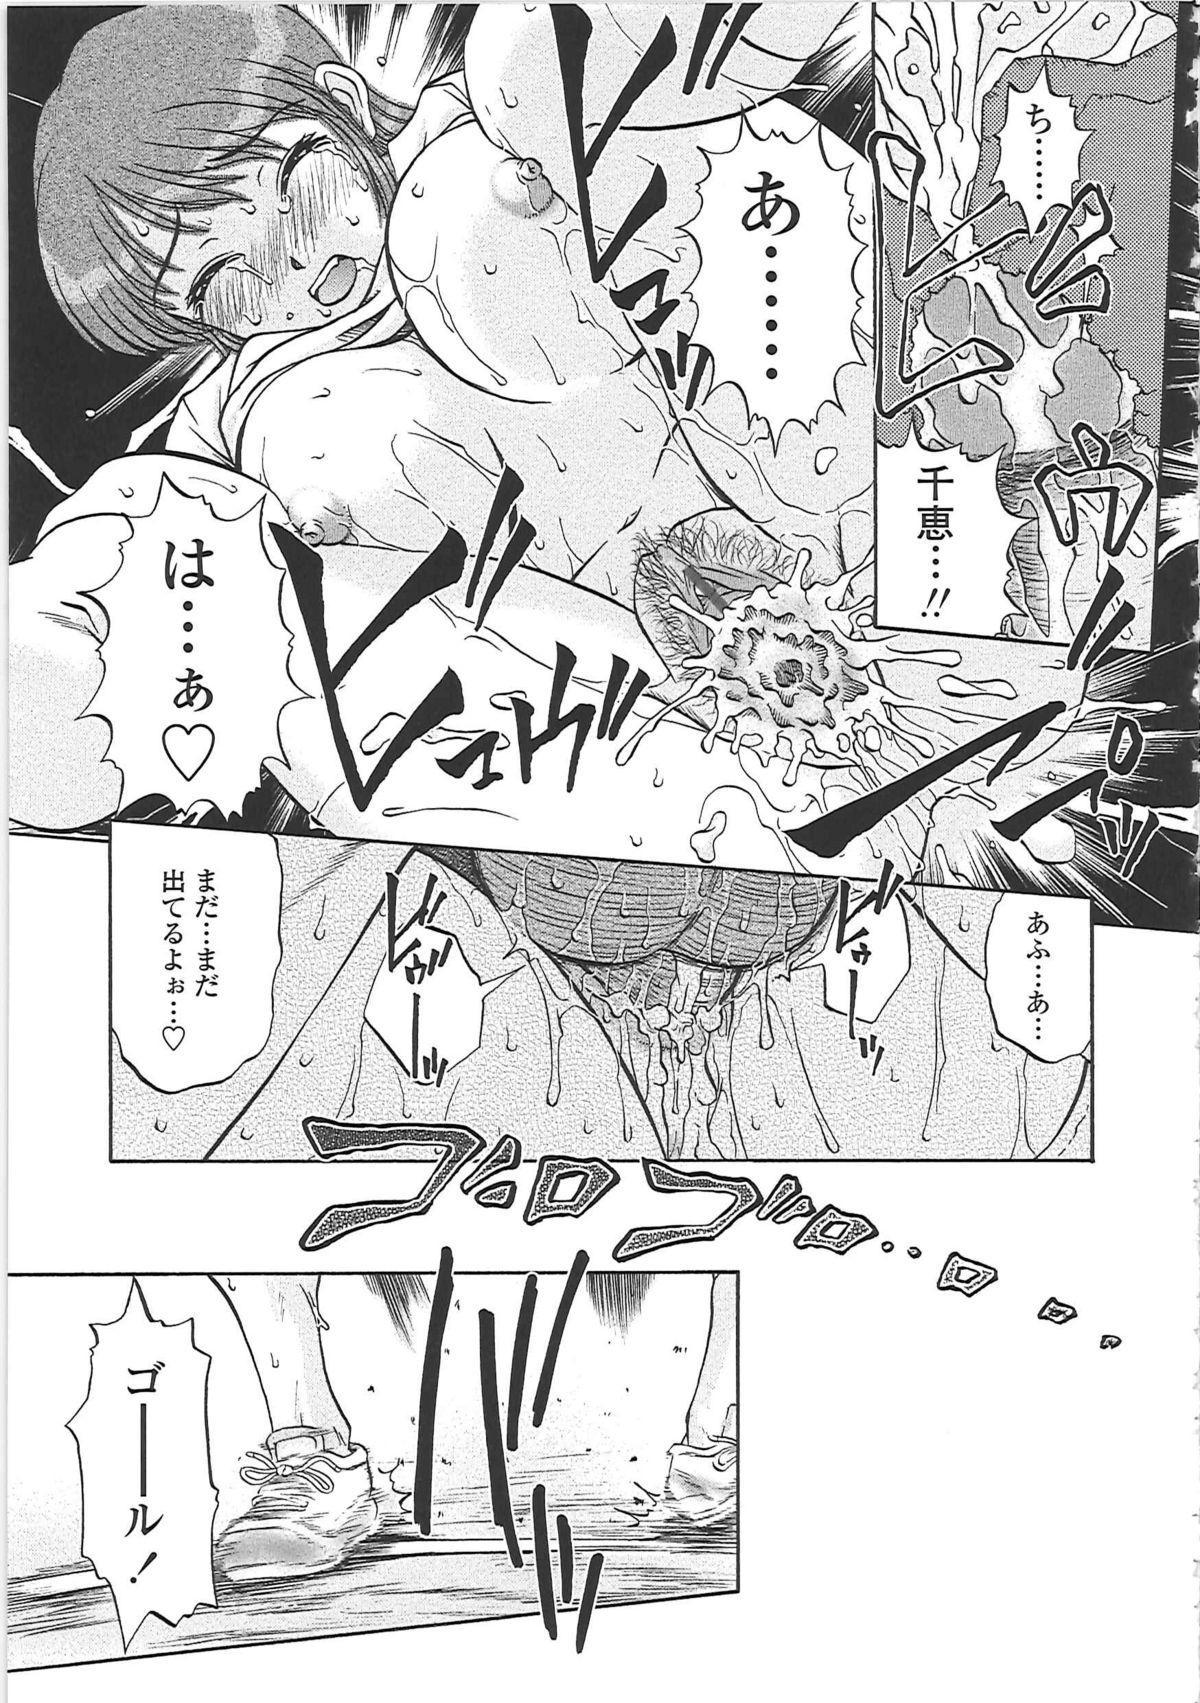 Nikuzuma Tsuushin - Erotic Wife Communication 177